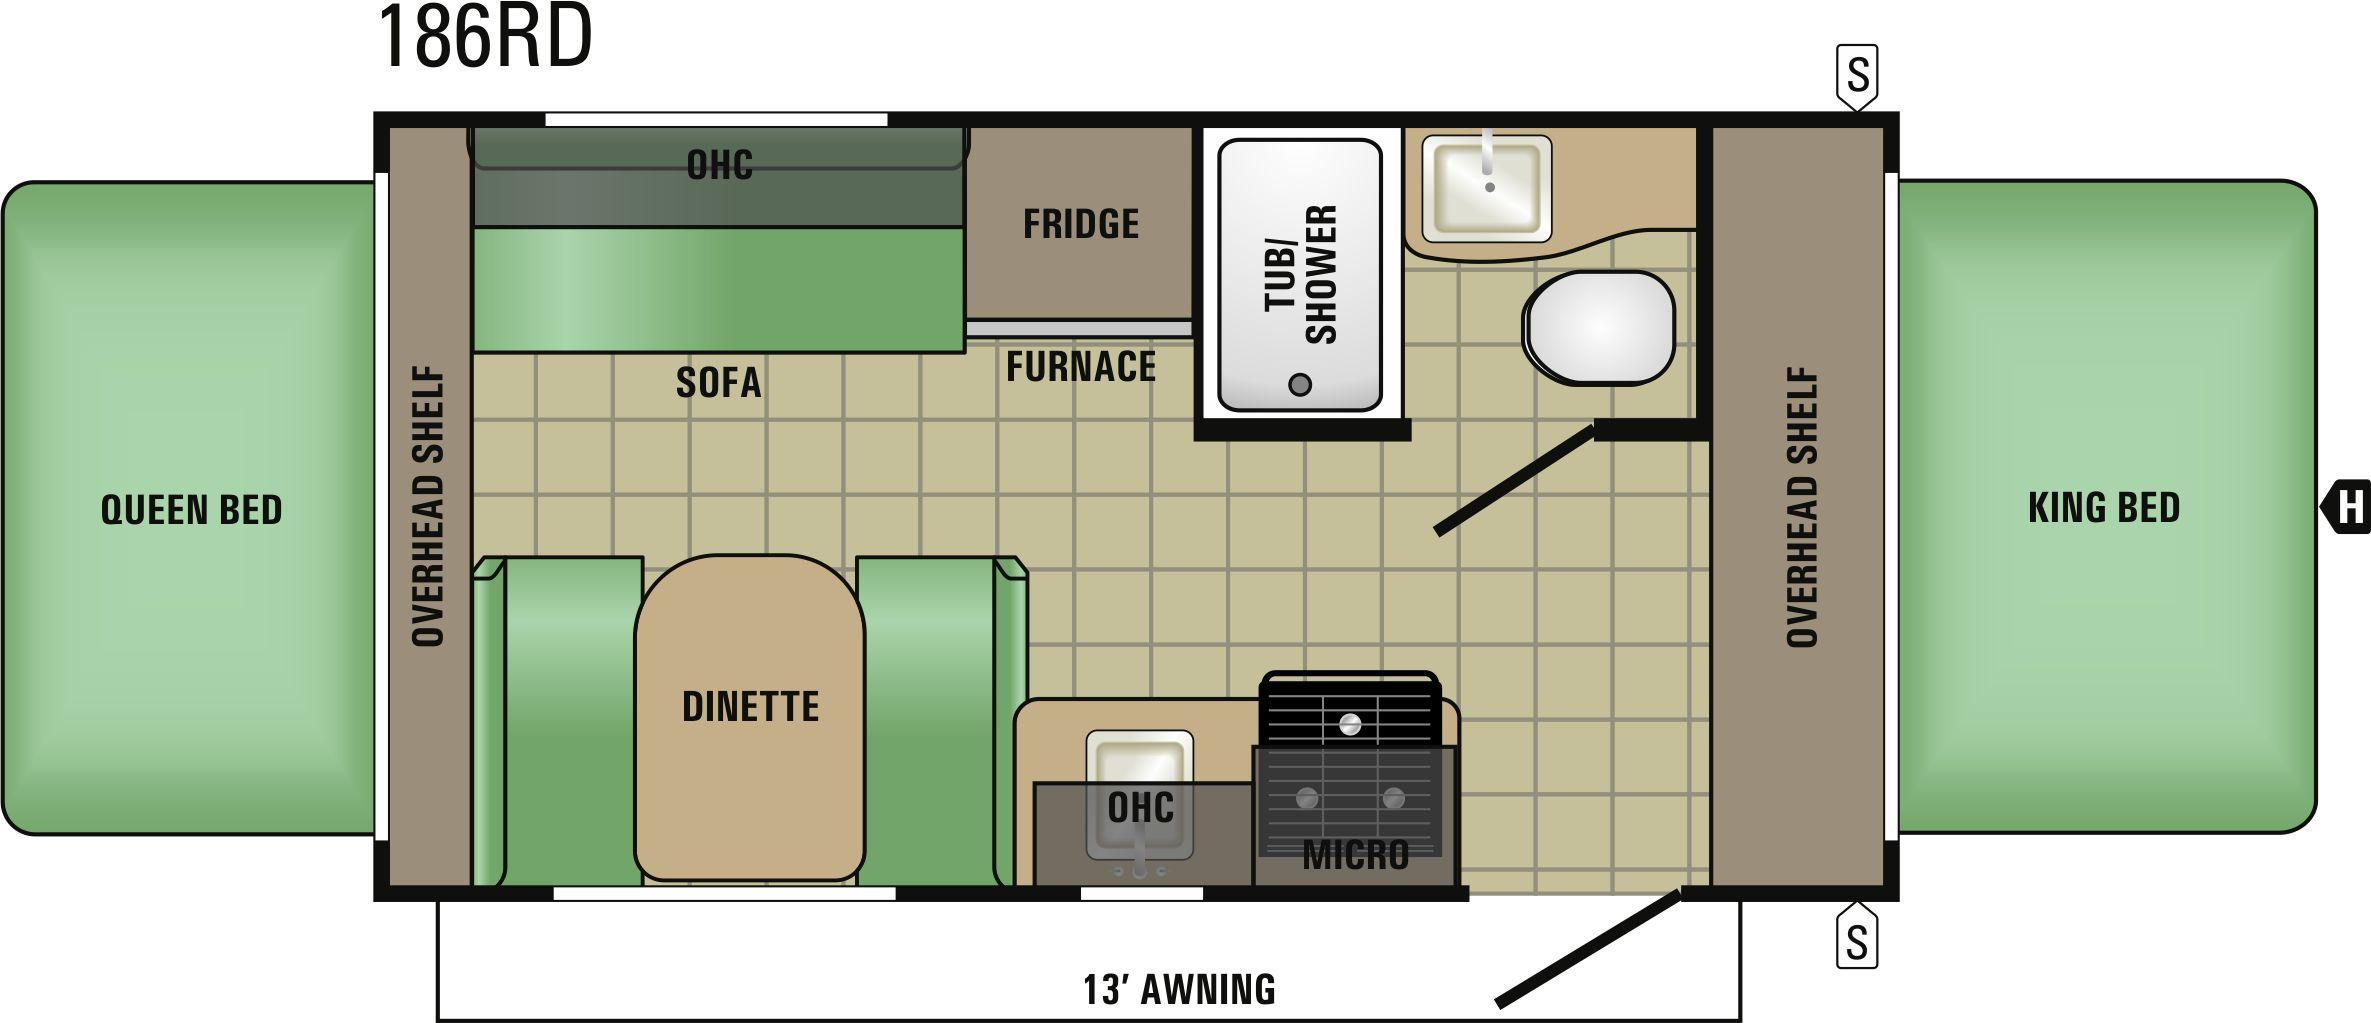 186RD Floorplan